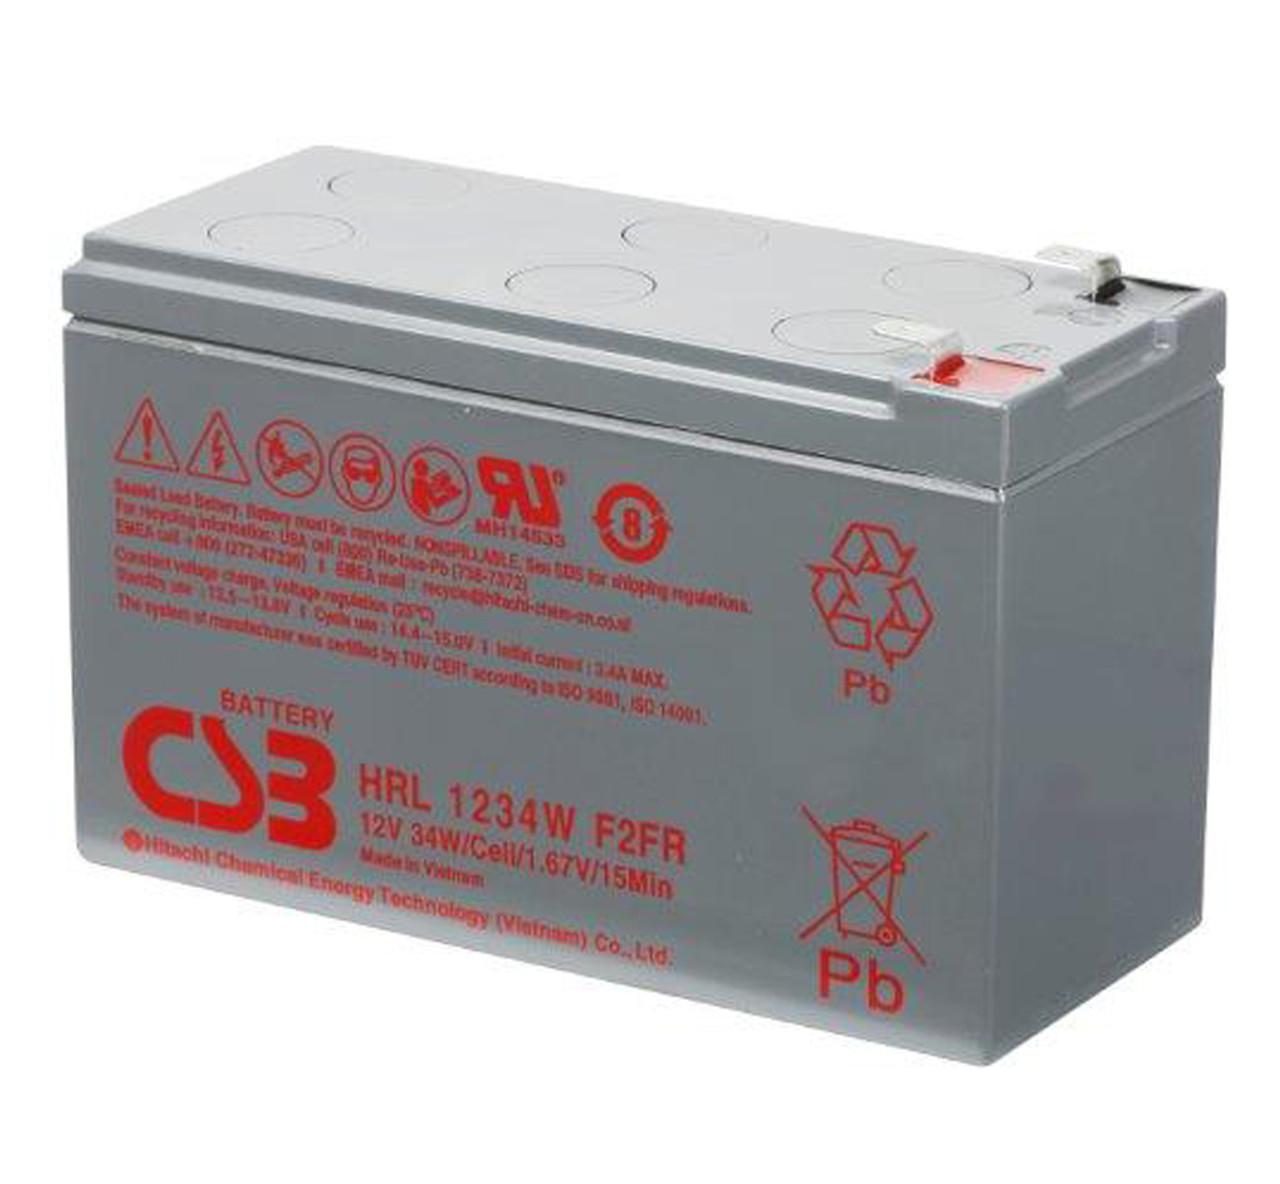 HRL1234WF2FR 12V 9AH 34W High Rate CSB Battery